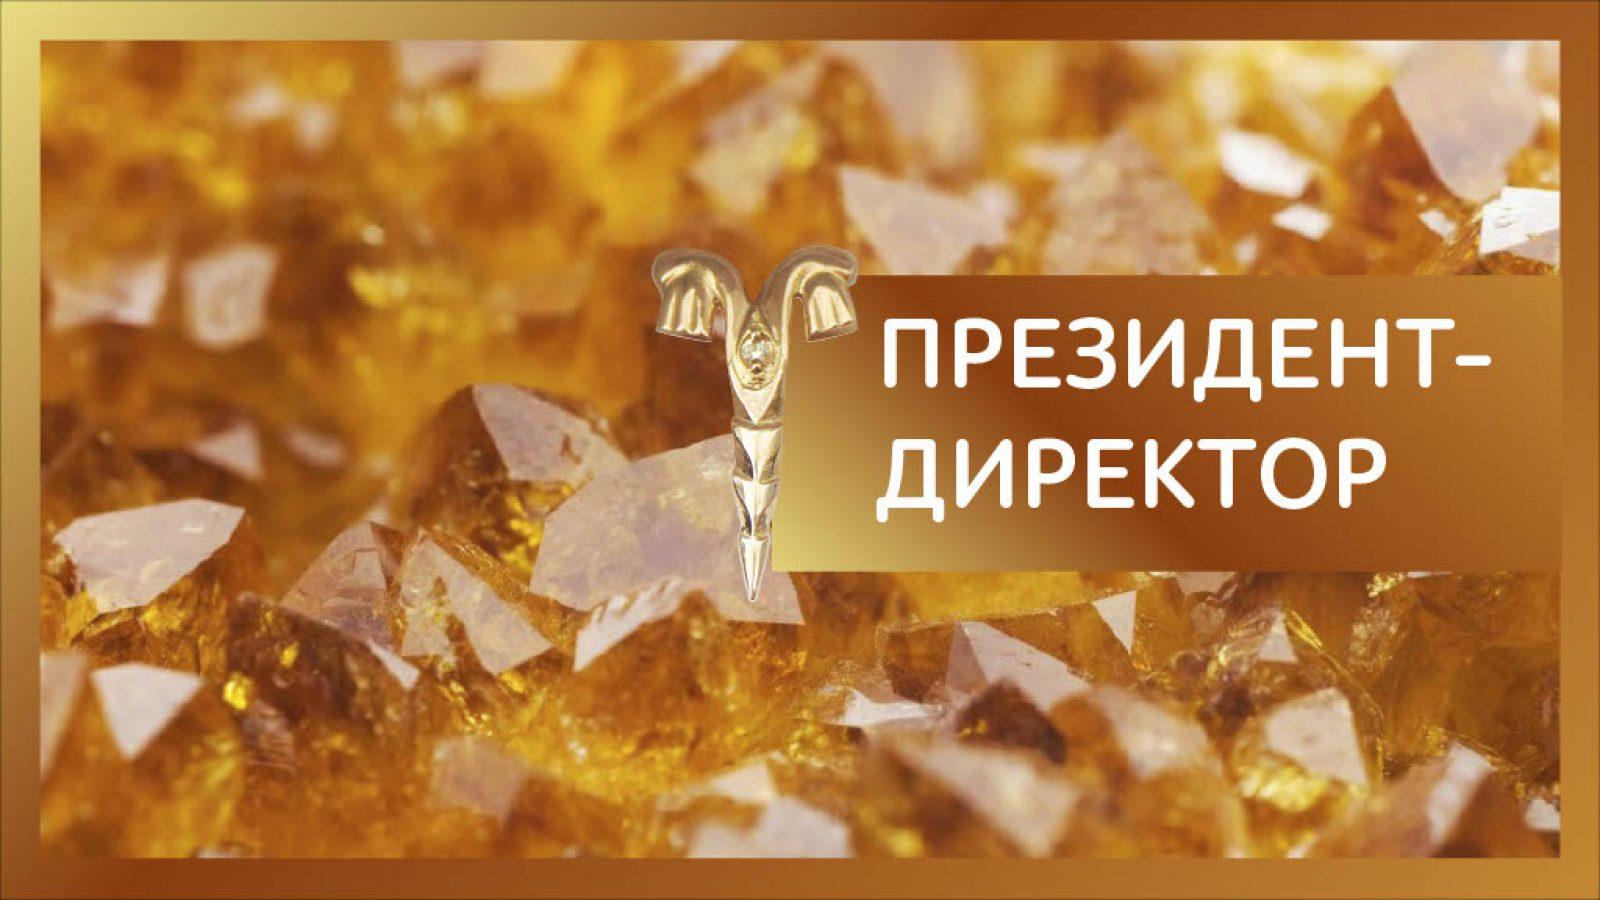 SHTV-2020-_-E-TL-TBTV-TVTGTBTL-TL-TB-TB-_69-TBTVTA1024_62